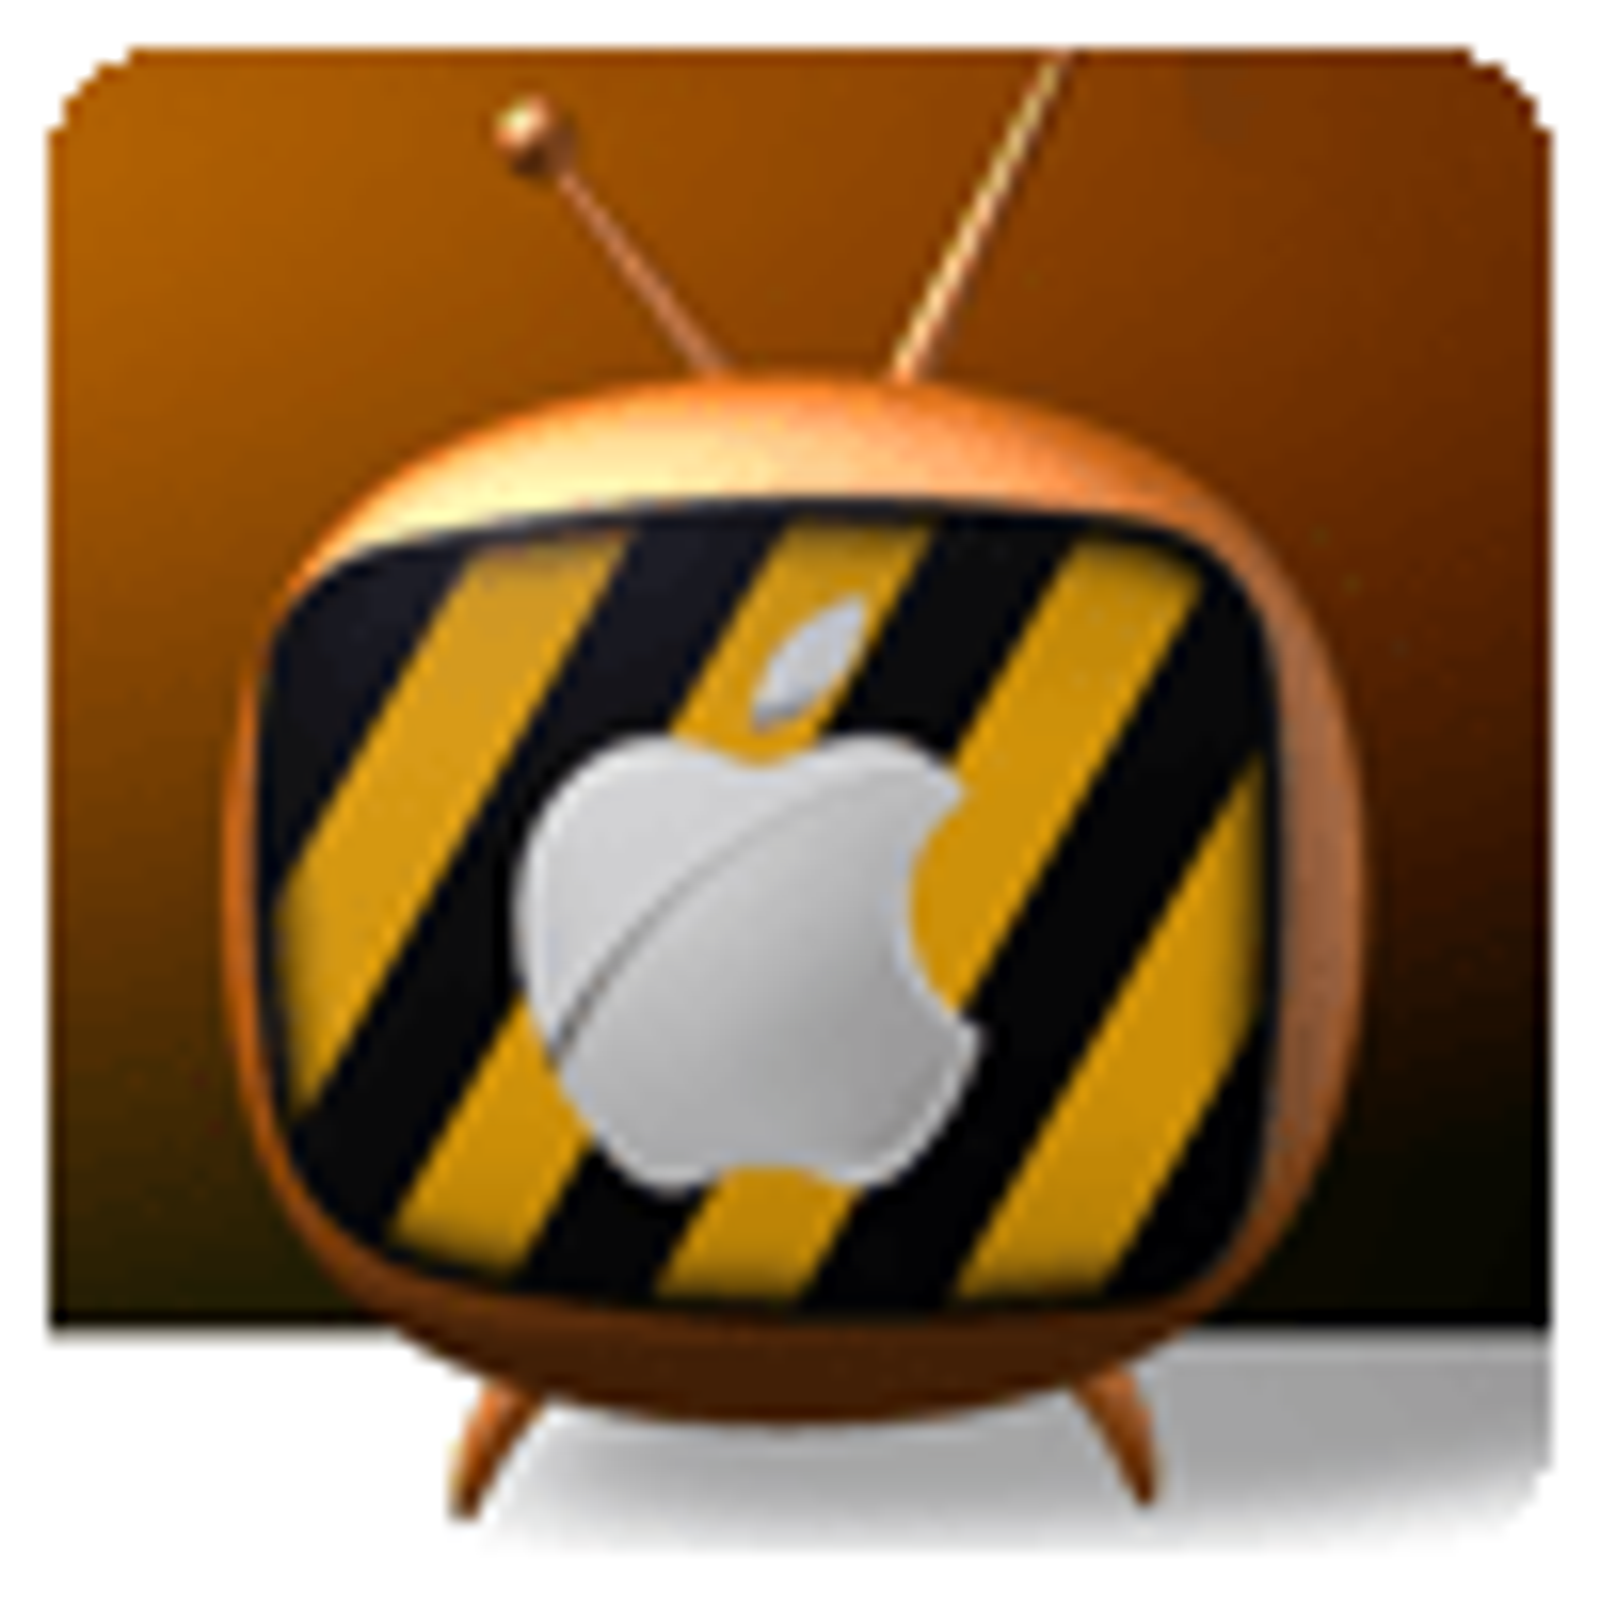 Zattoo 4.0.3 Beta